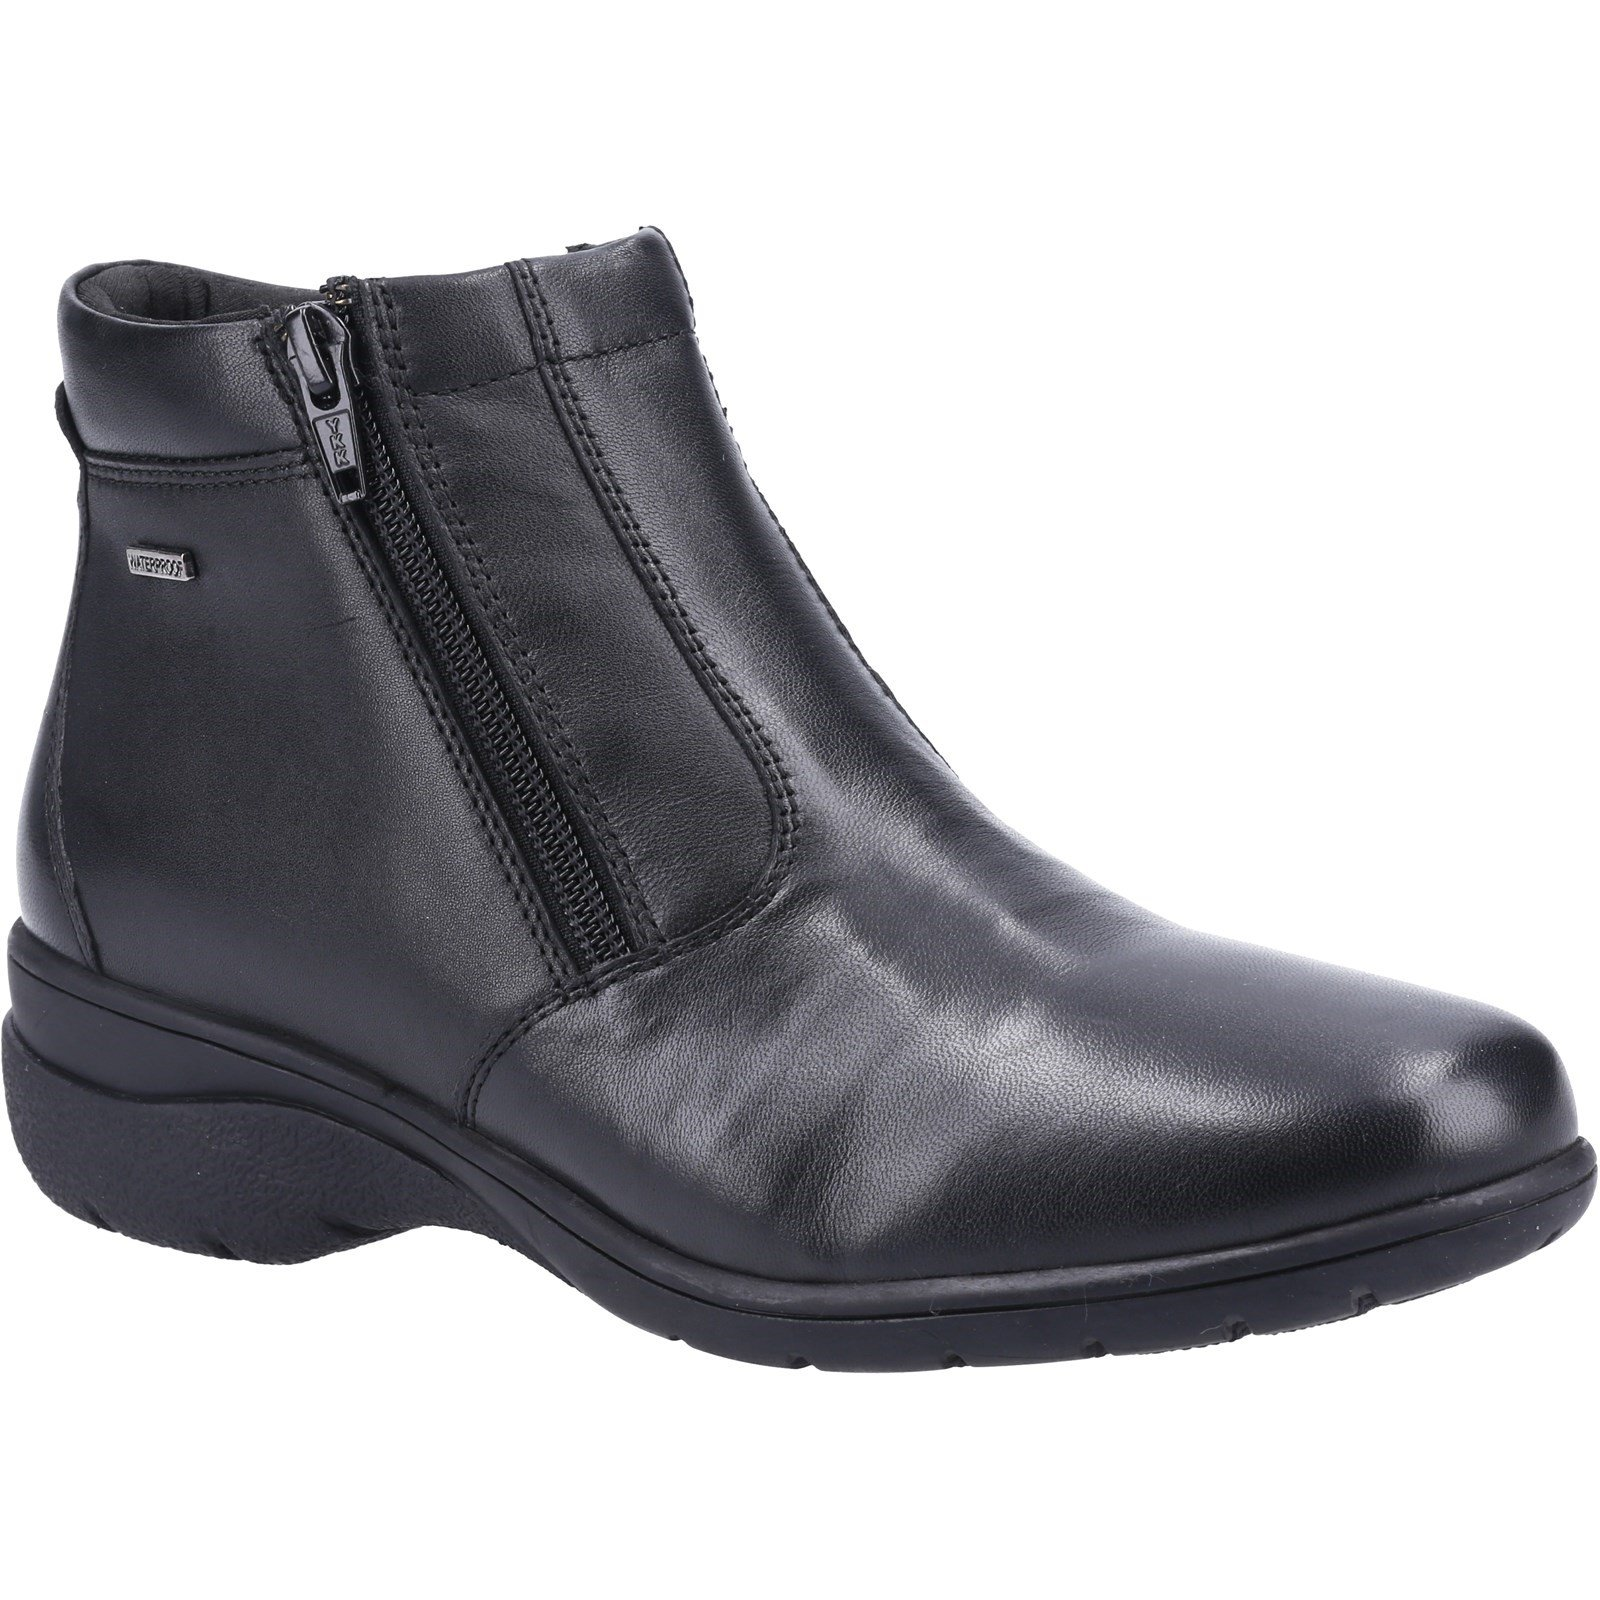 Cotswold Women's Deerhurst Waterproof Boot Black - Black 4